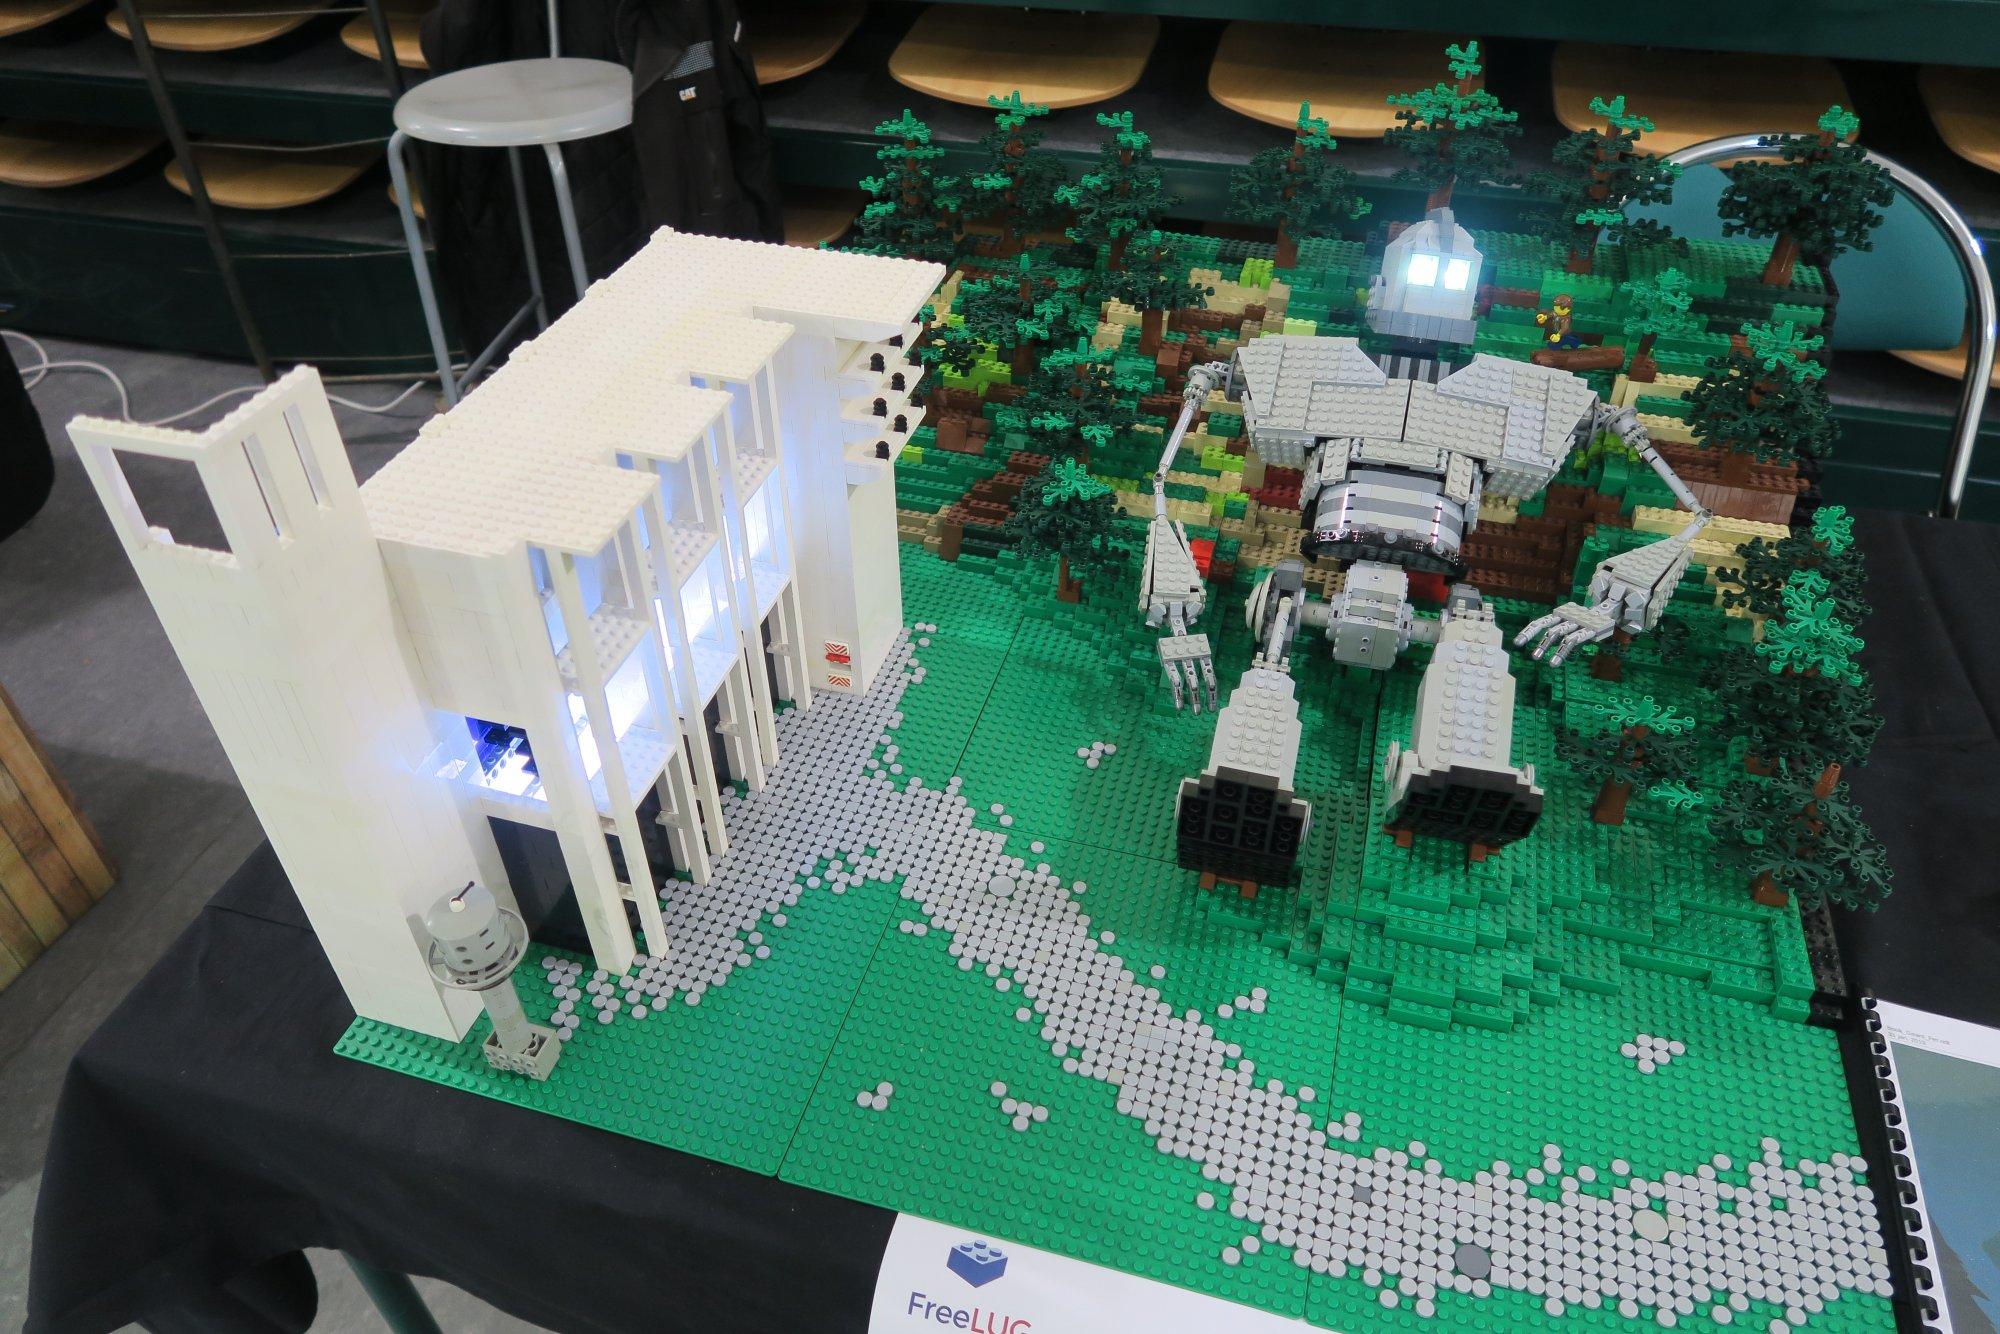 Table Basse Lego Geant stand freelug à caramanga 2019 - freelug